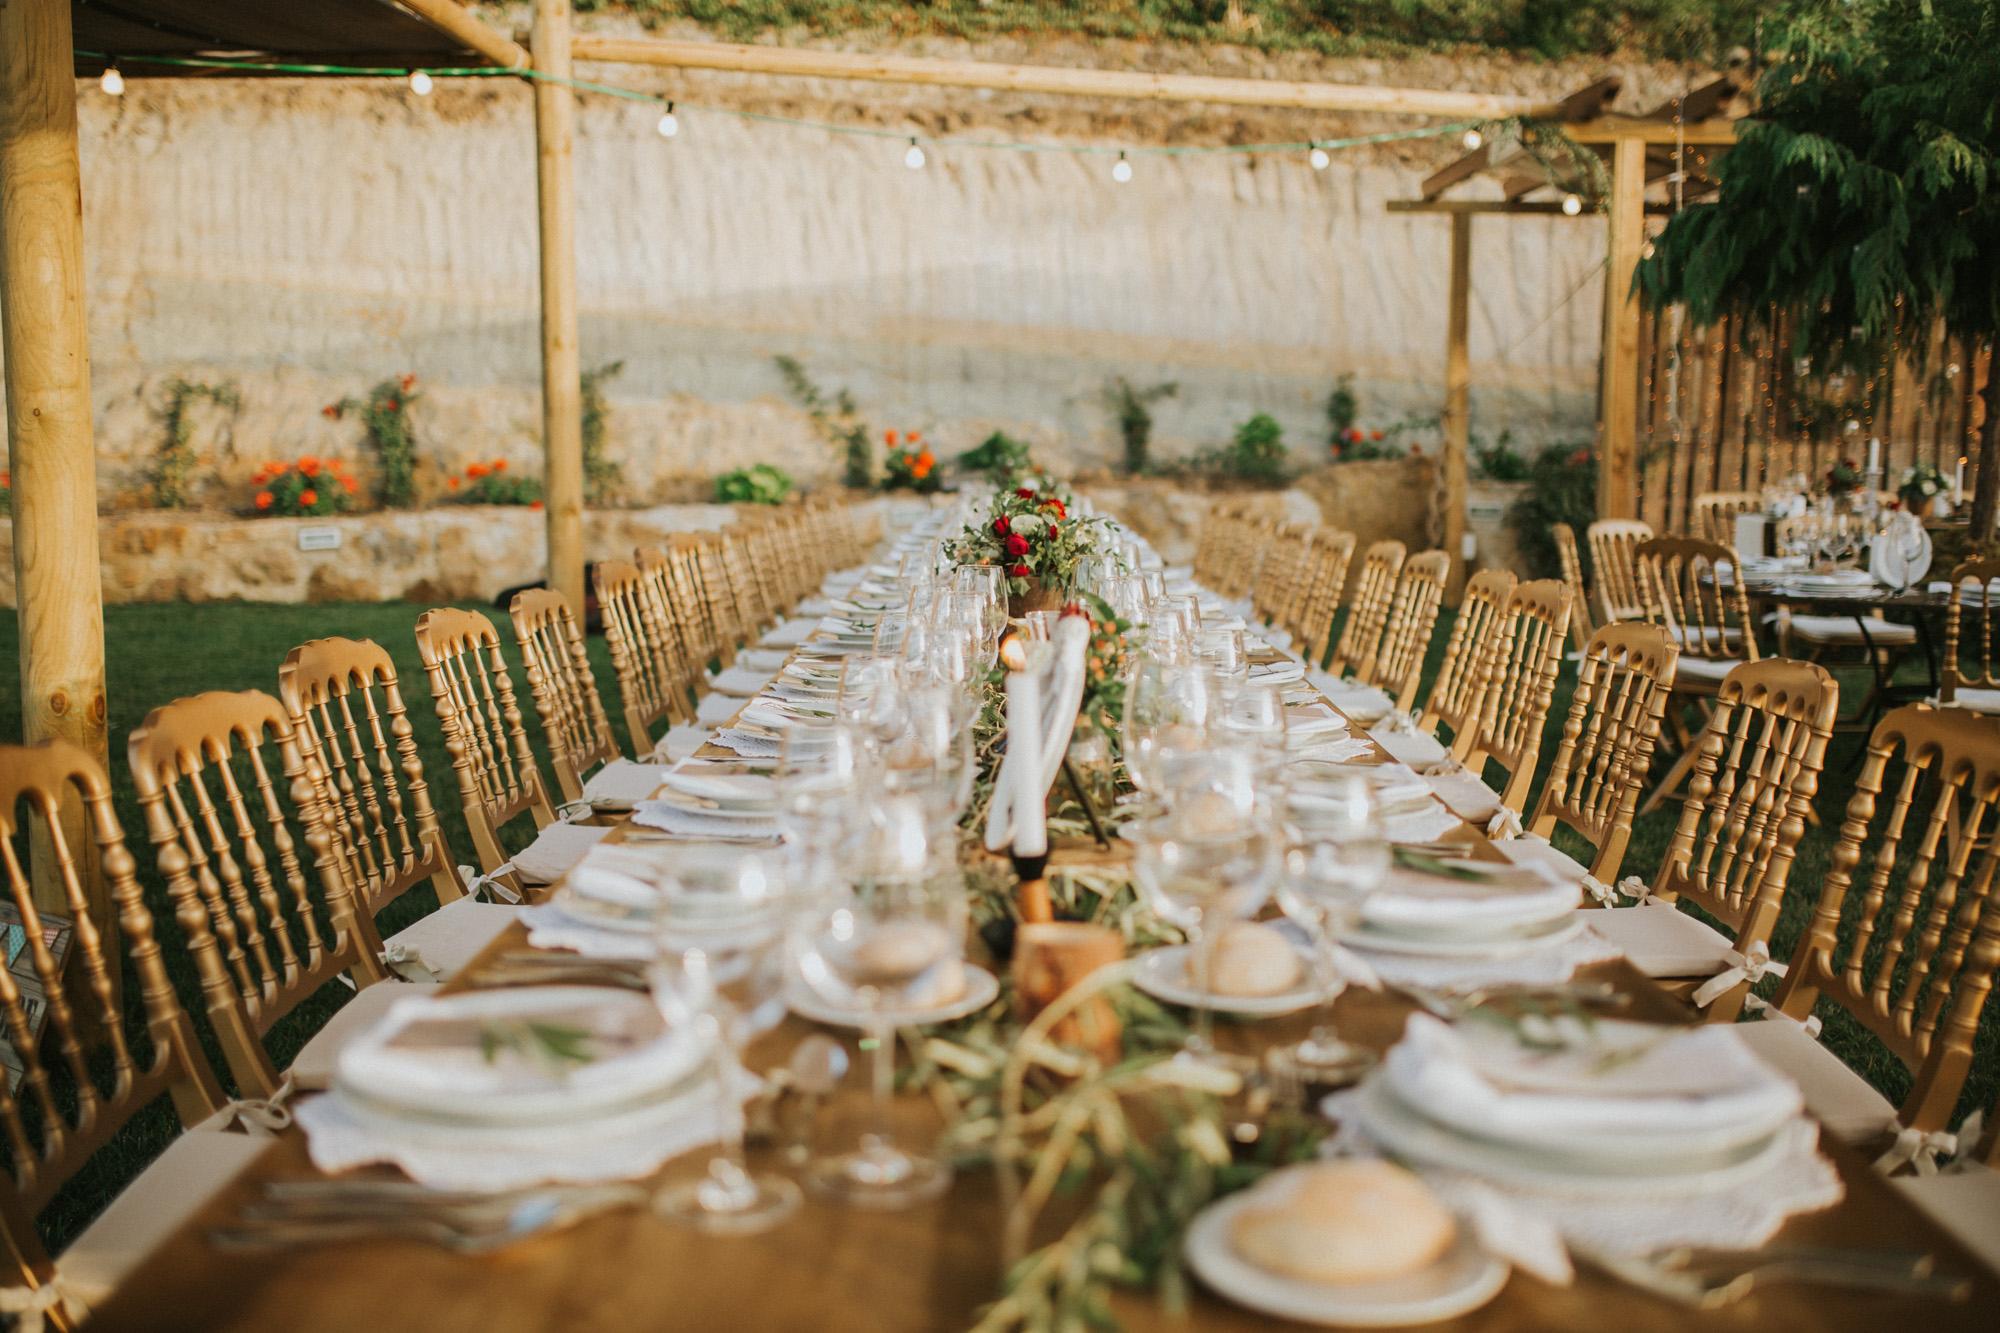 064-carina-e-samuel-wedding-casamento-quinta-dos-rouxinois-rustico-my-fancy-wedding-mafra-malveira-lisboa-sintra-cascais-filipe-santiago-fotografia-fotografo-lifestyle-destination-portugal